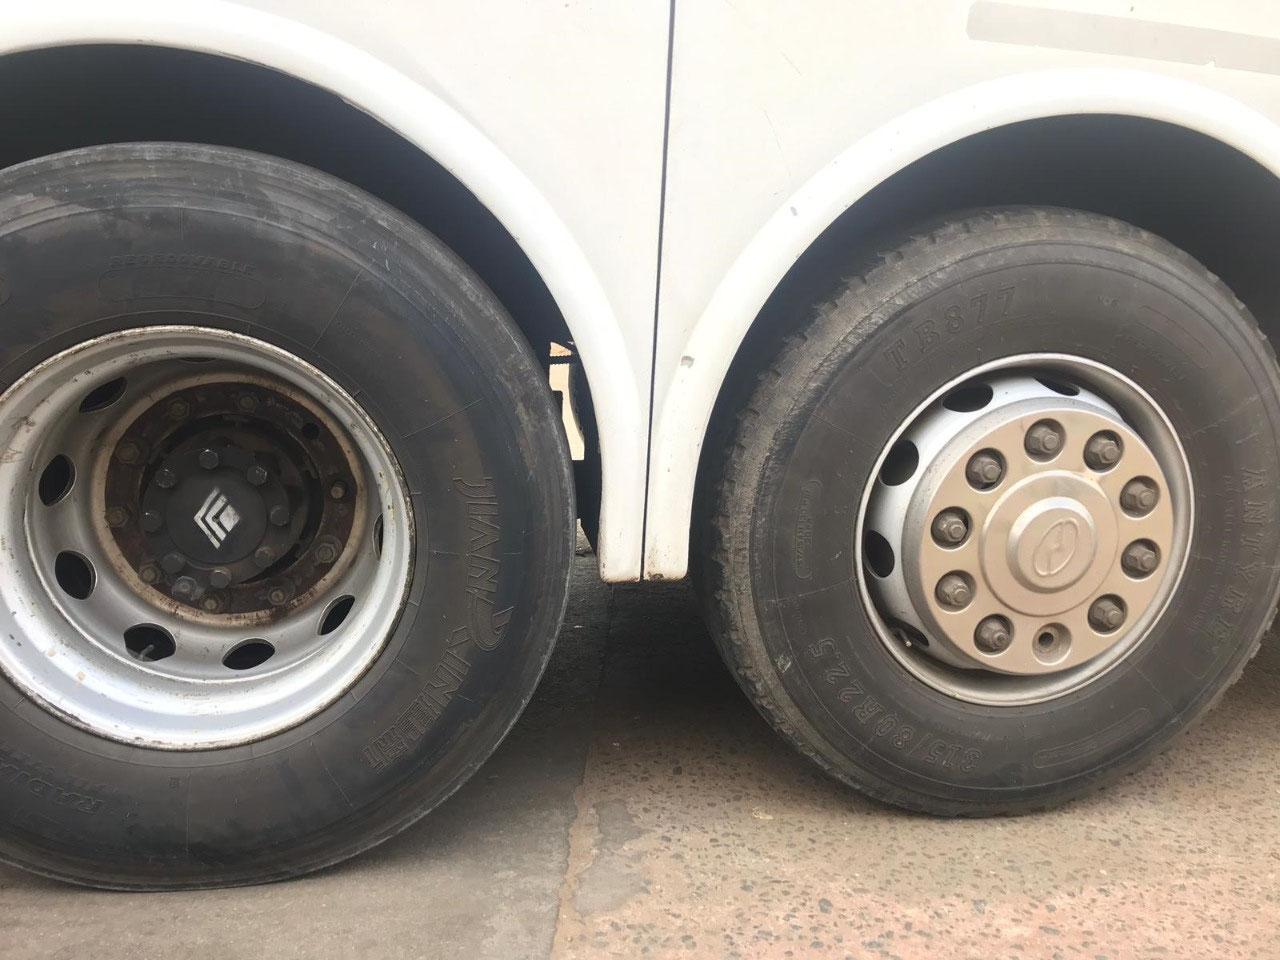 Missing lug nut (right) on bus